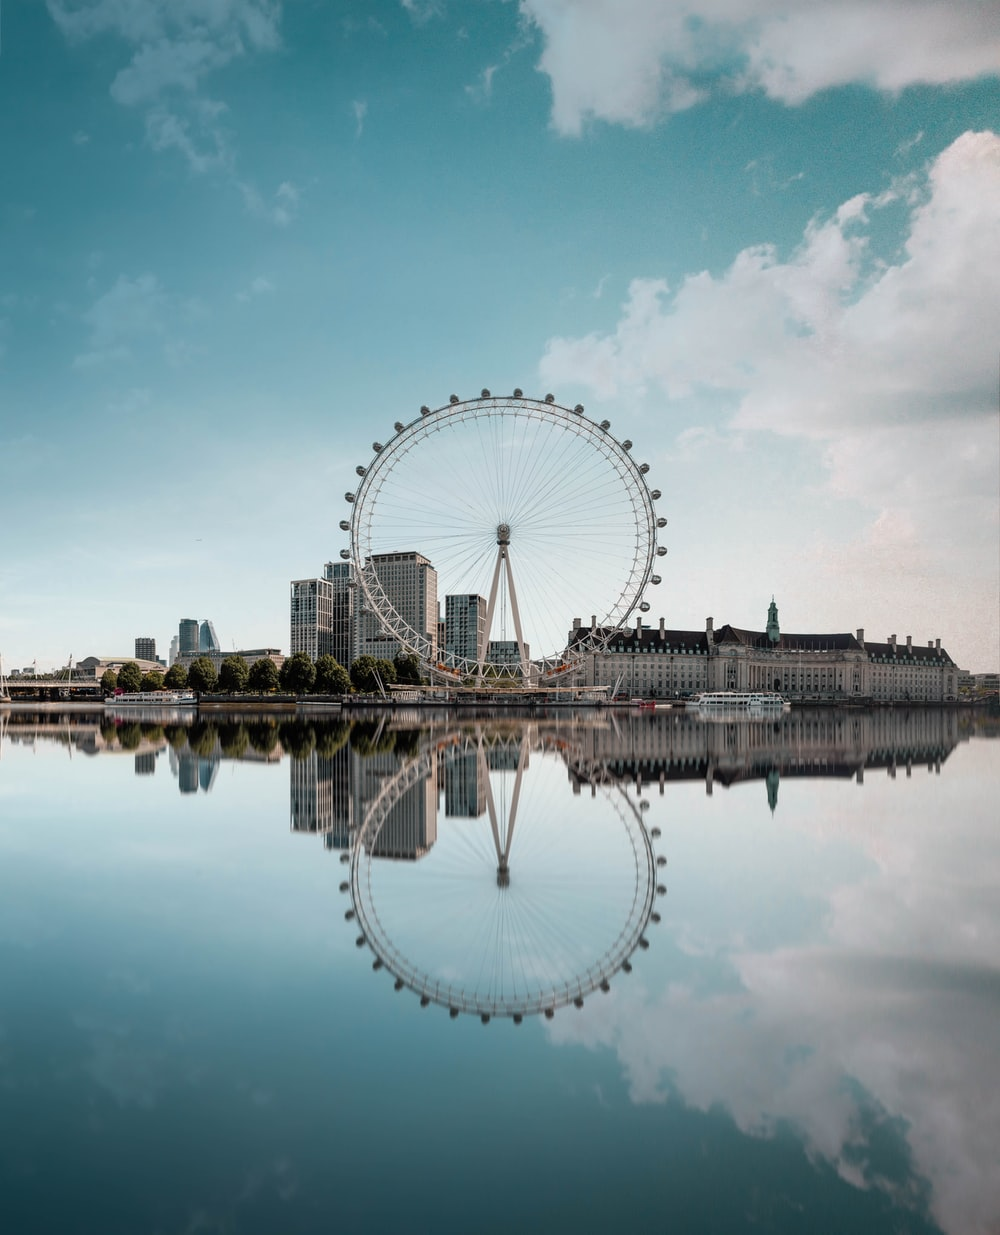 ferris wheel beside body of water under blue sky during daytime